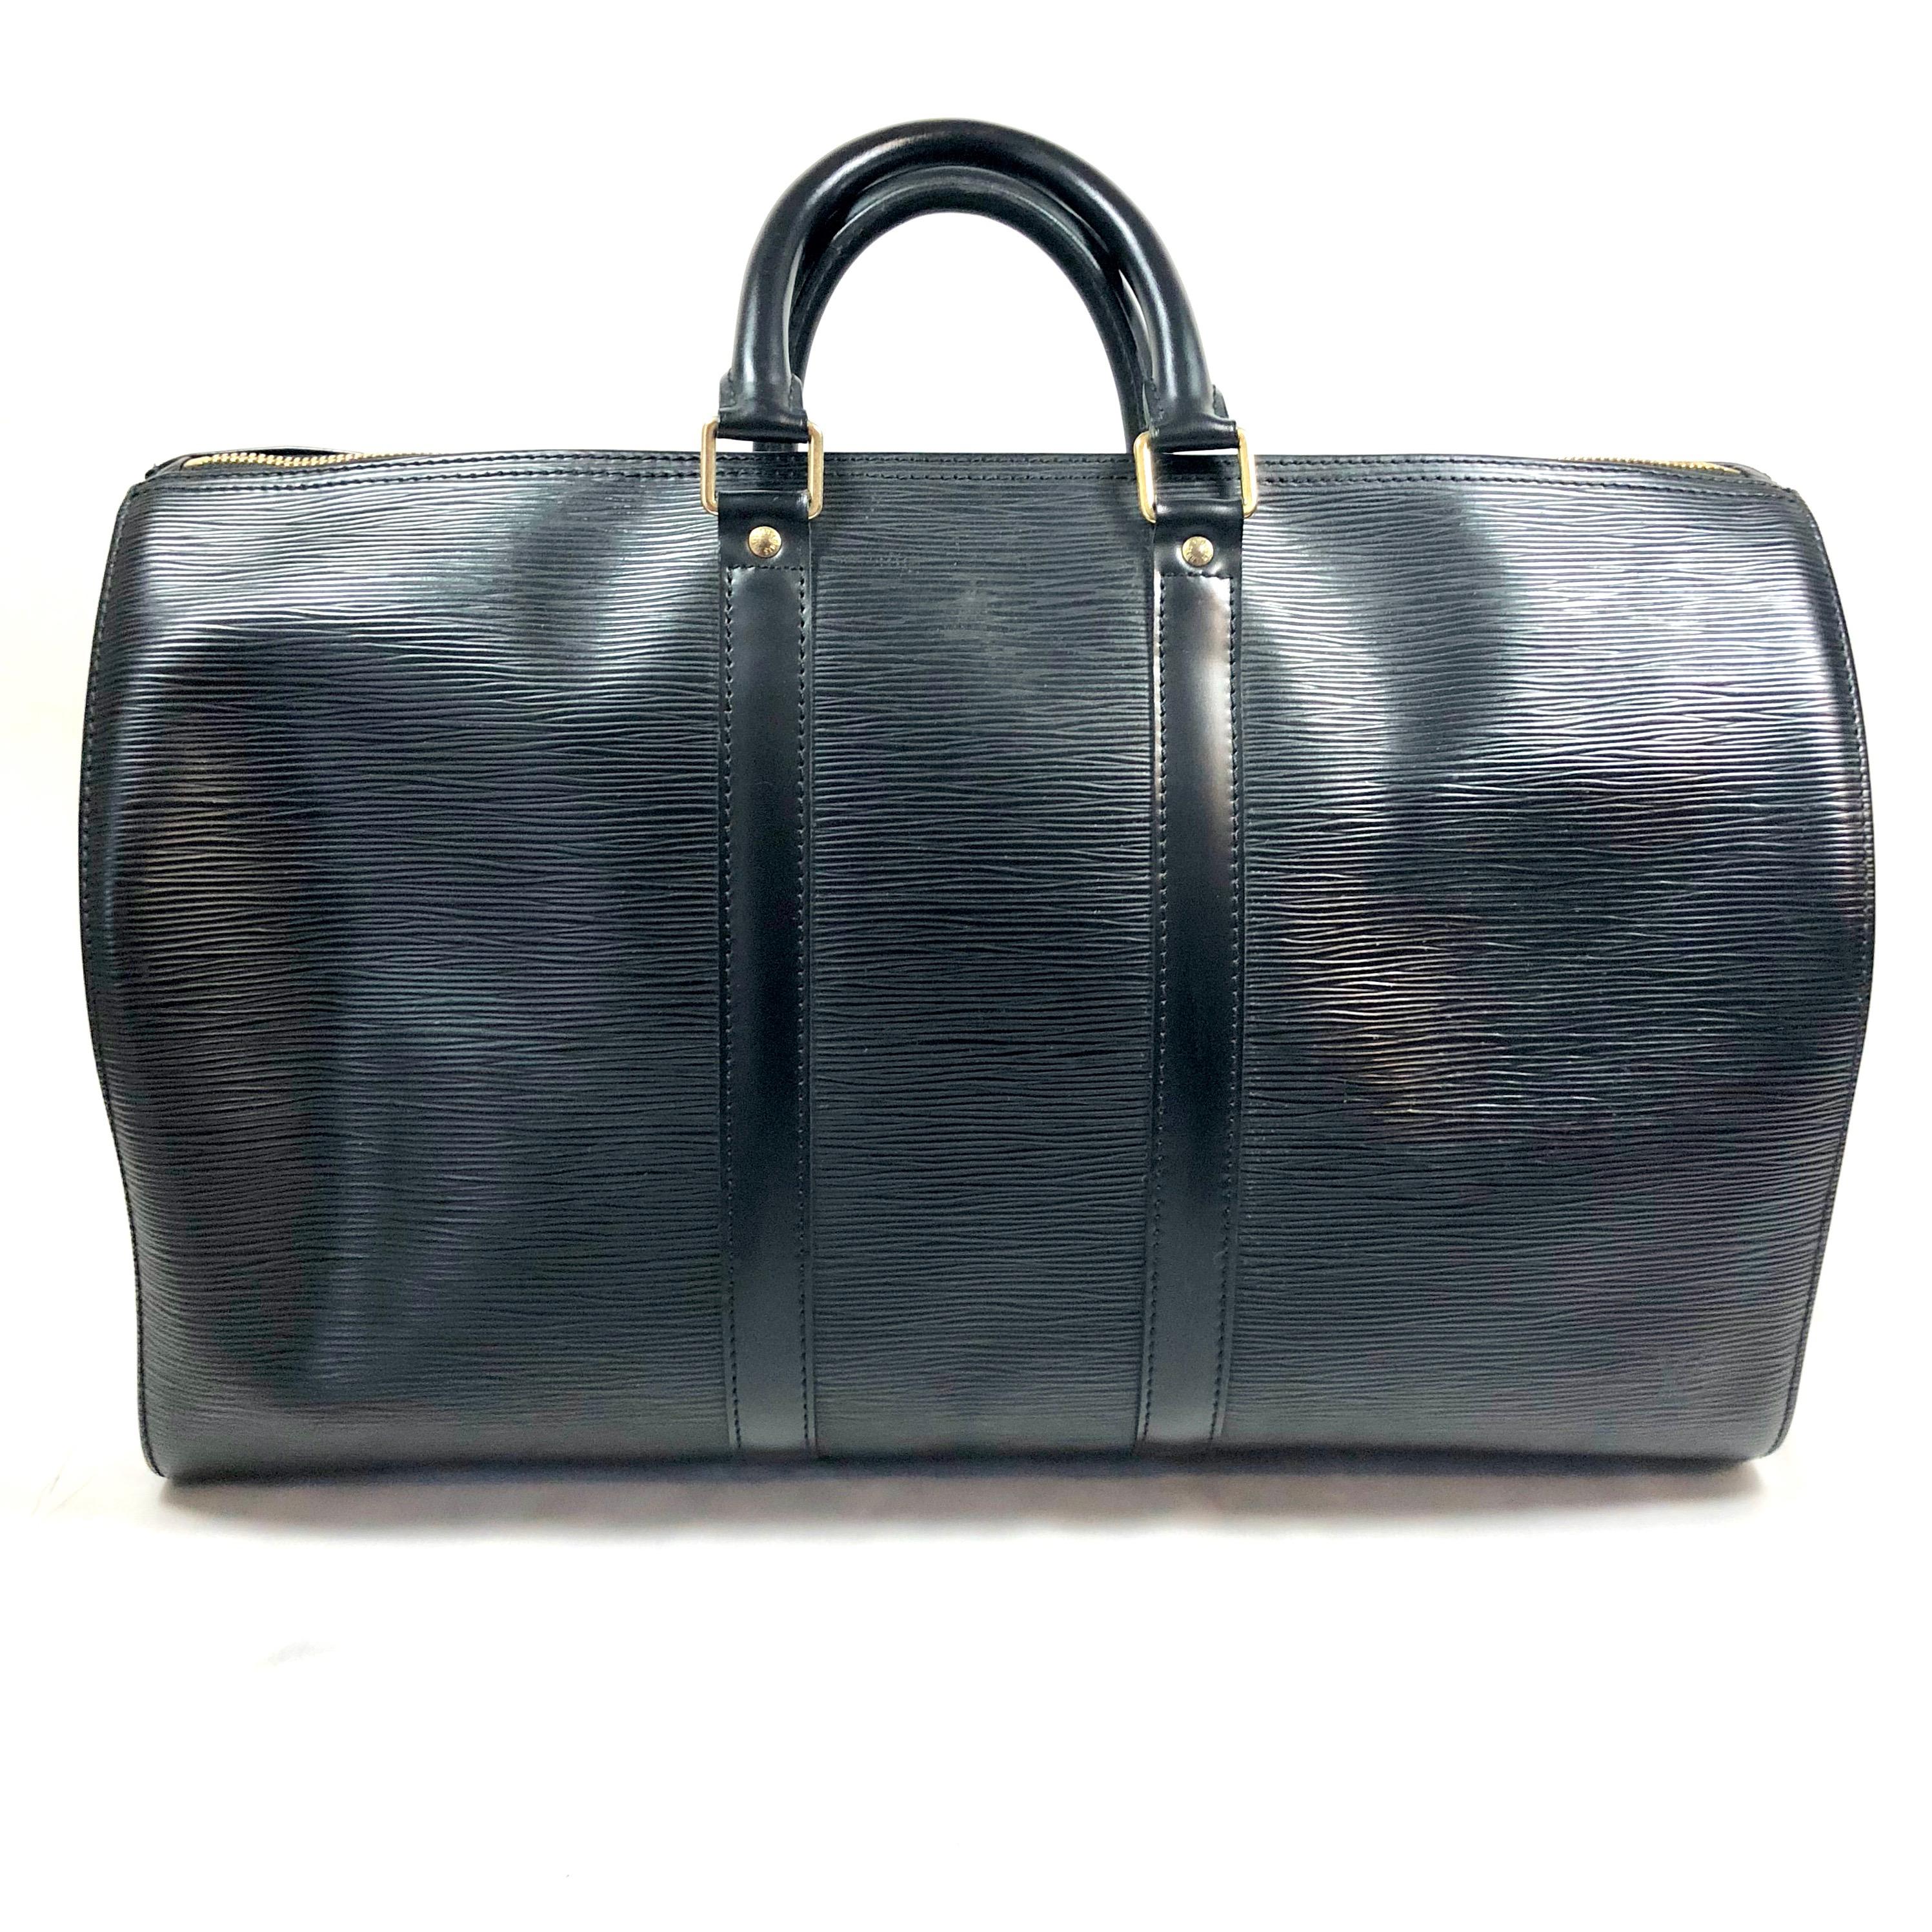 dbba1ead553e Louis Vuitton Keepall 45 In Epi Leather Still Fashion